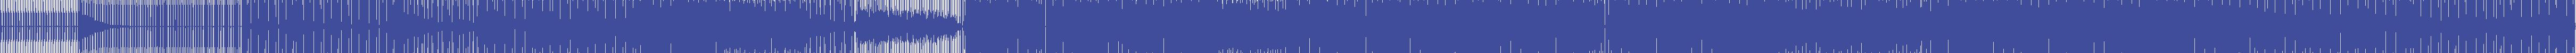 just_digital_records [JS1204] Maurizio Jave - Flash Break [Original Mix] audio wave form